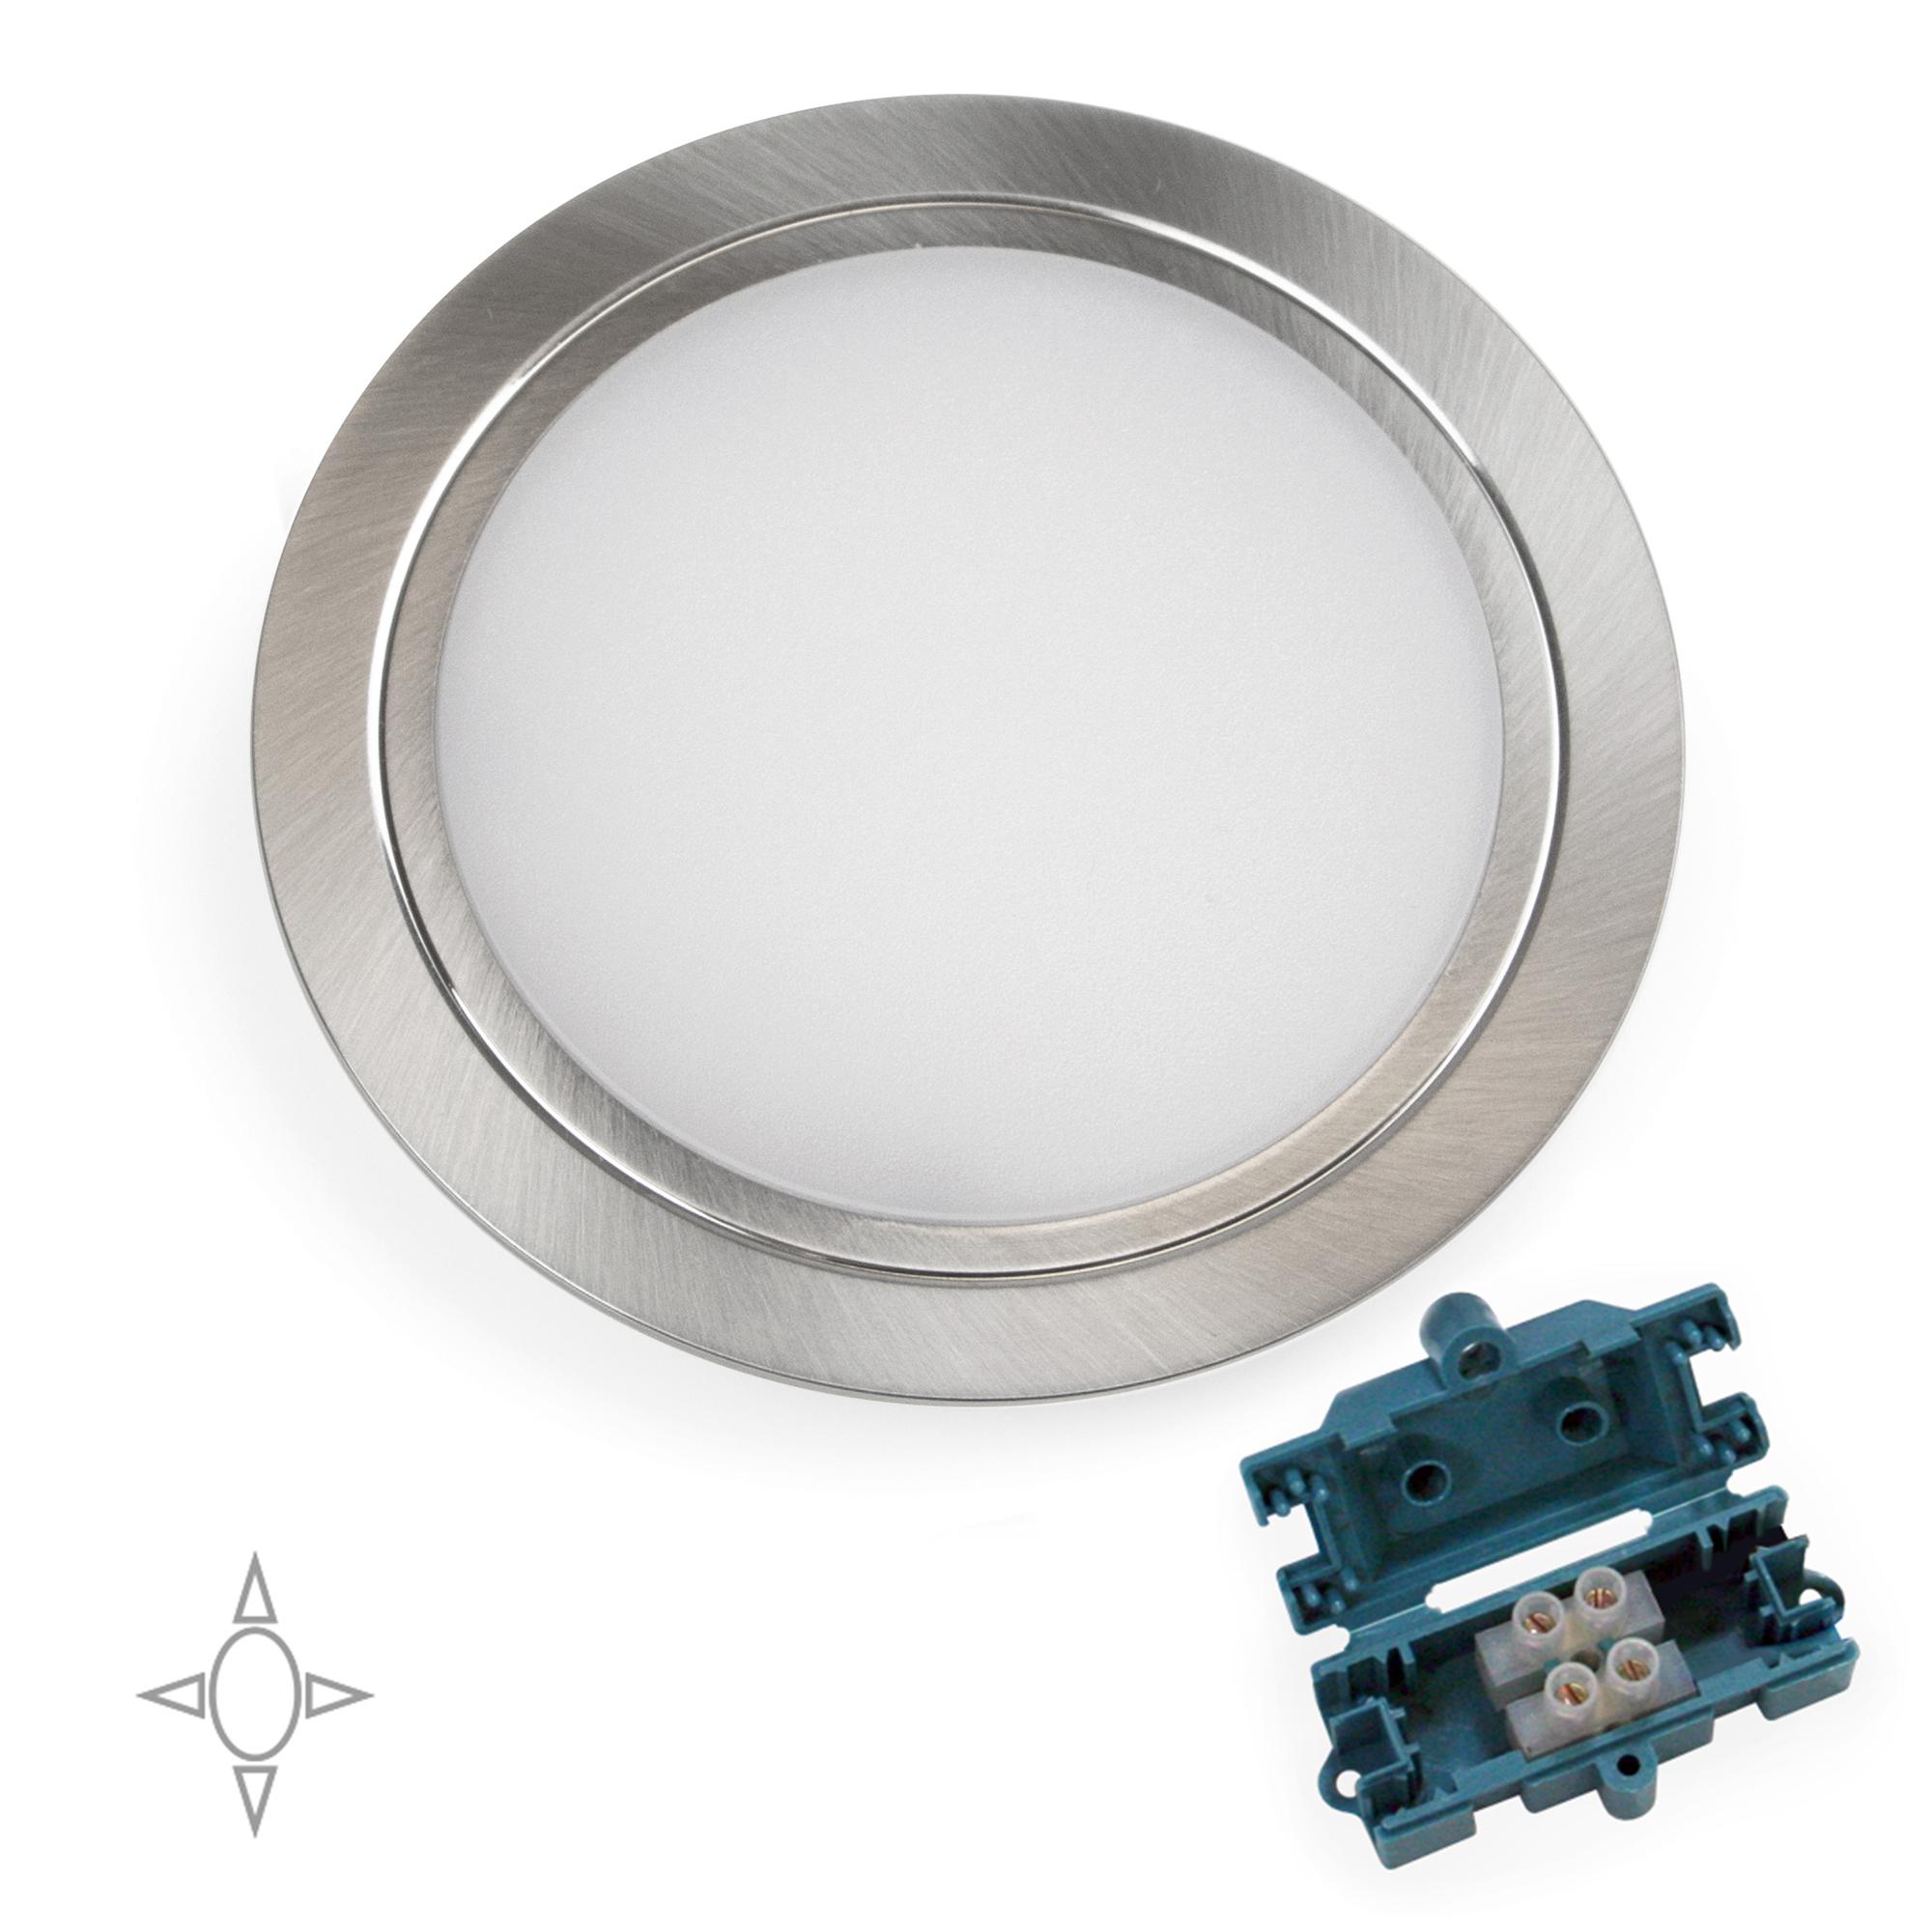 Emuca Faretto led per mobile, diametro 84 mm, a incasso, nessun convertitore necessario, luce bianca naturale, acciaio e plastic